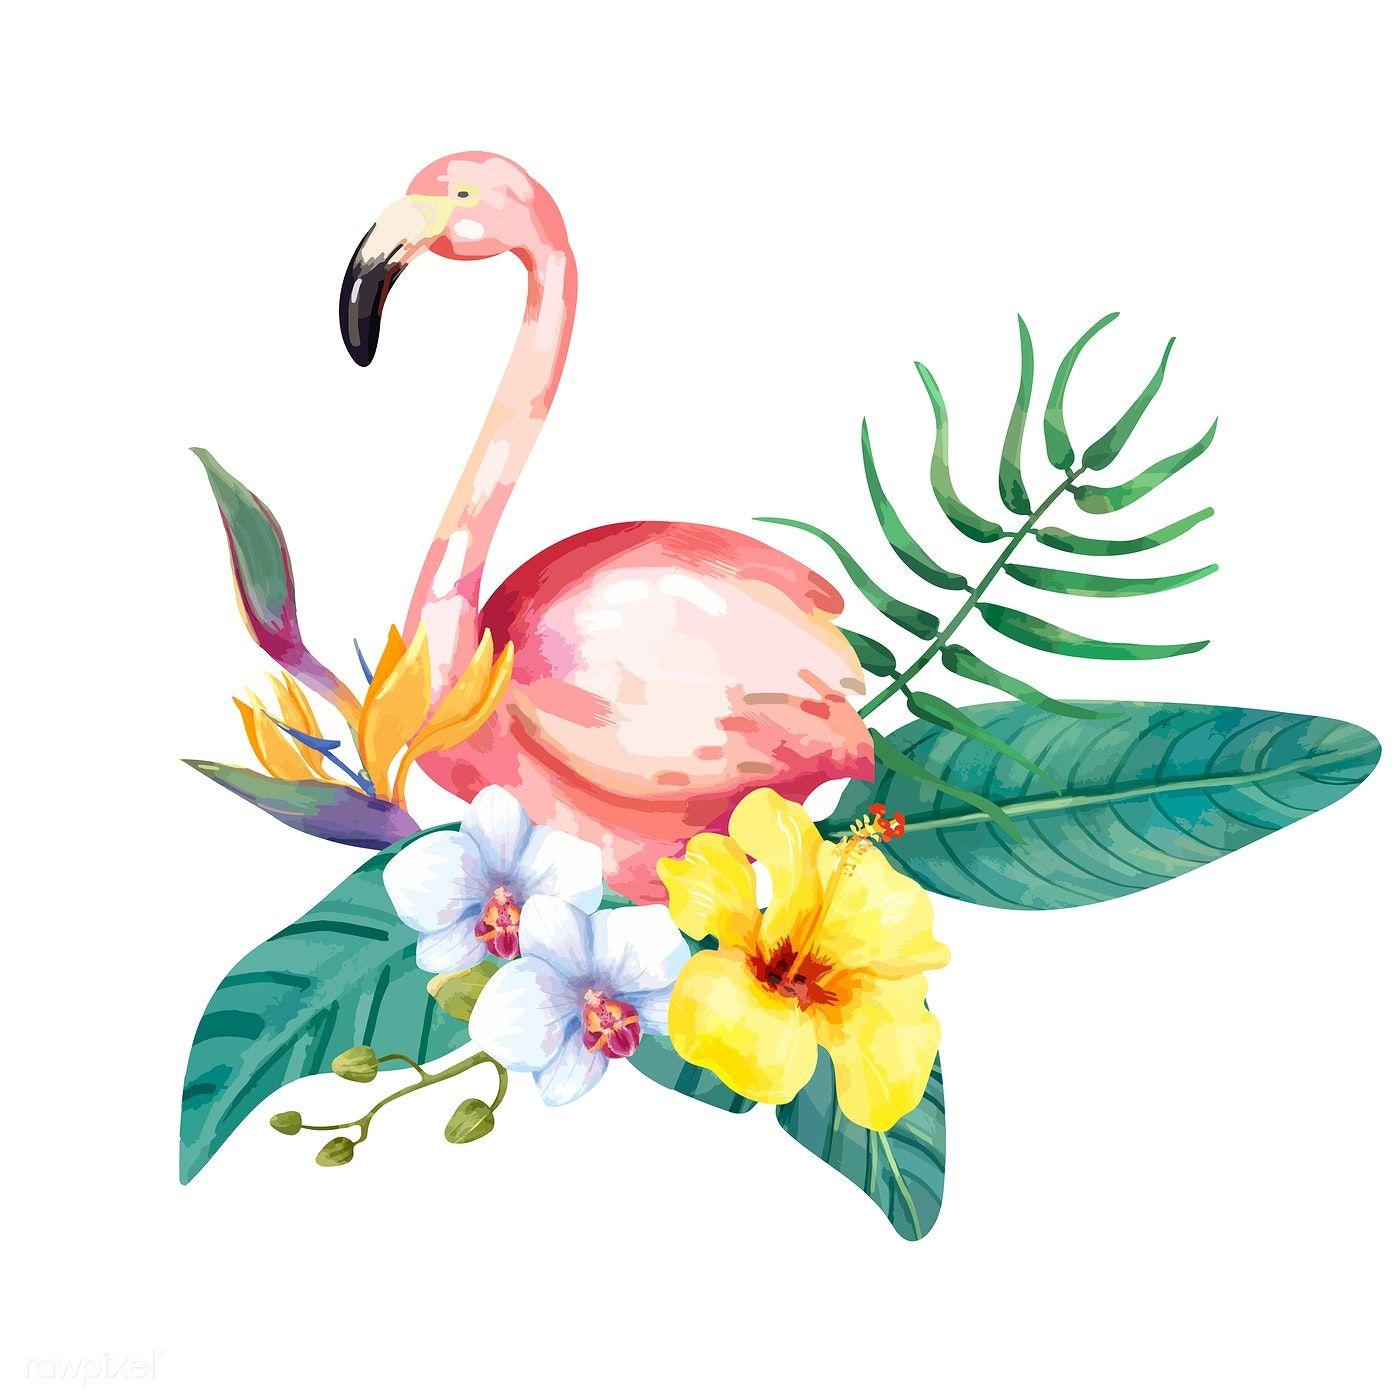 Download Premium Vector Of Hand Drawn Flamingo Bird With Tropical Flowers Flamingo Illustration Flamingo Bird Bird Illustration